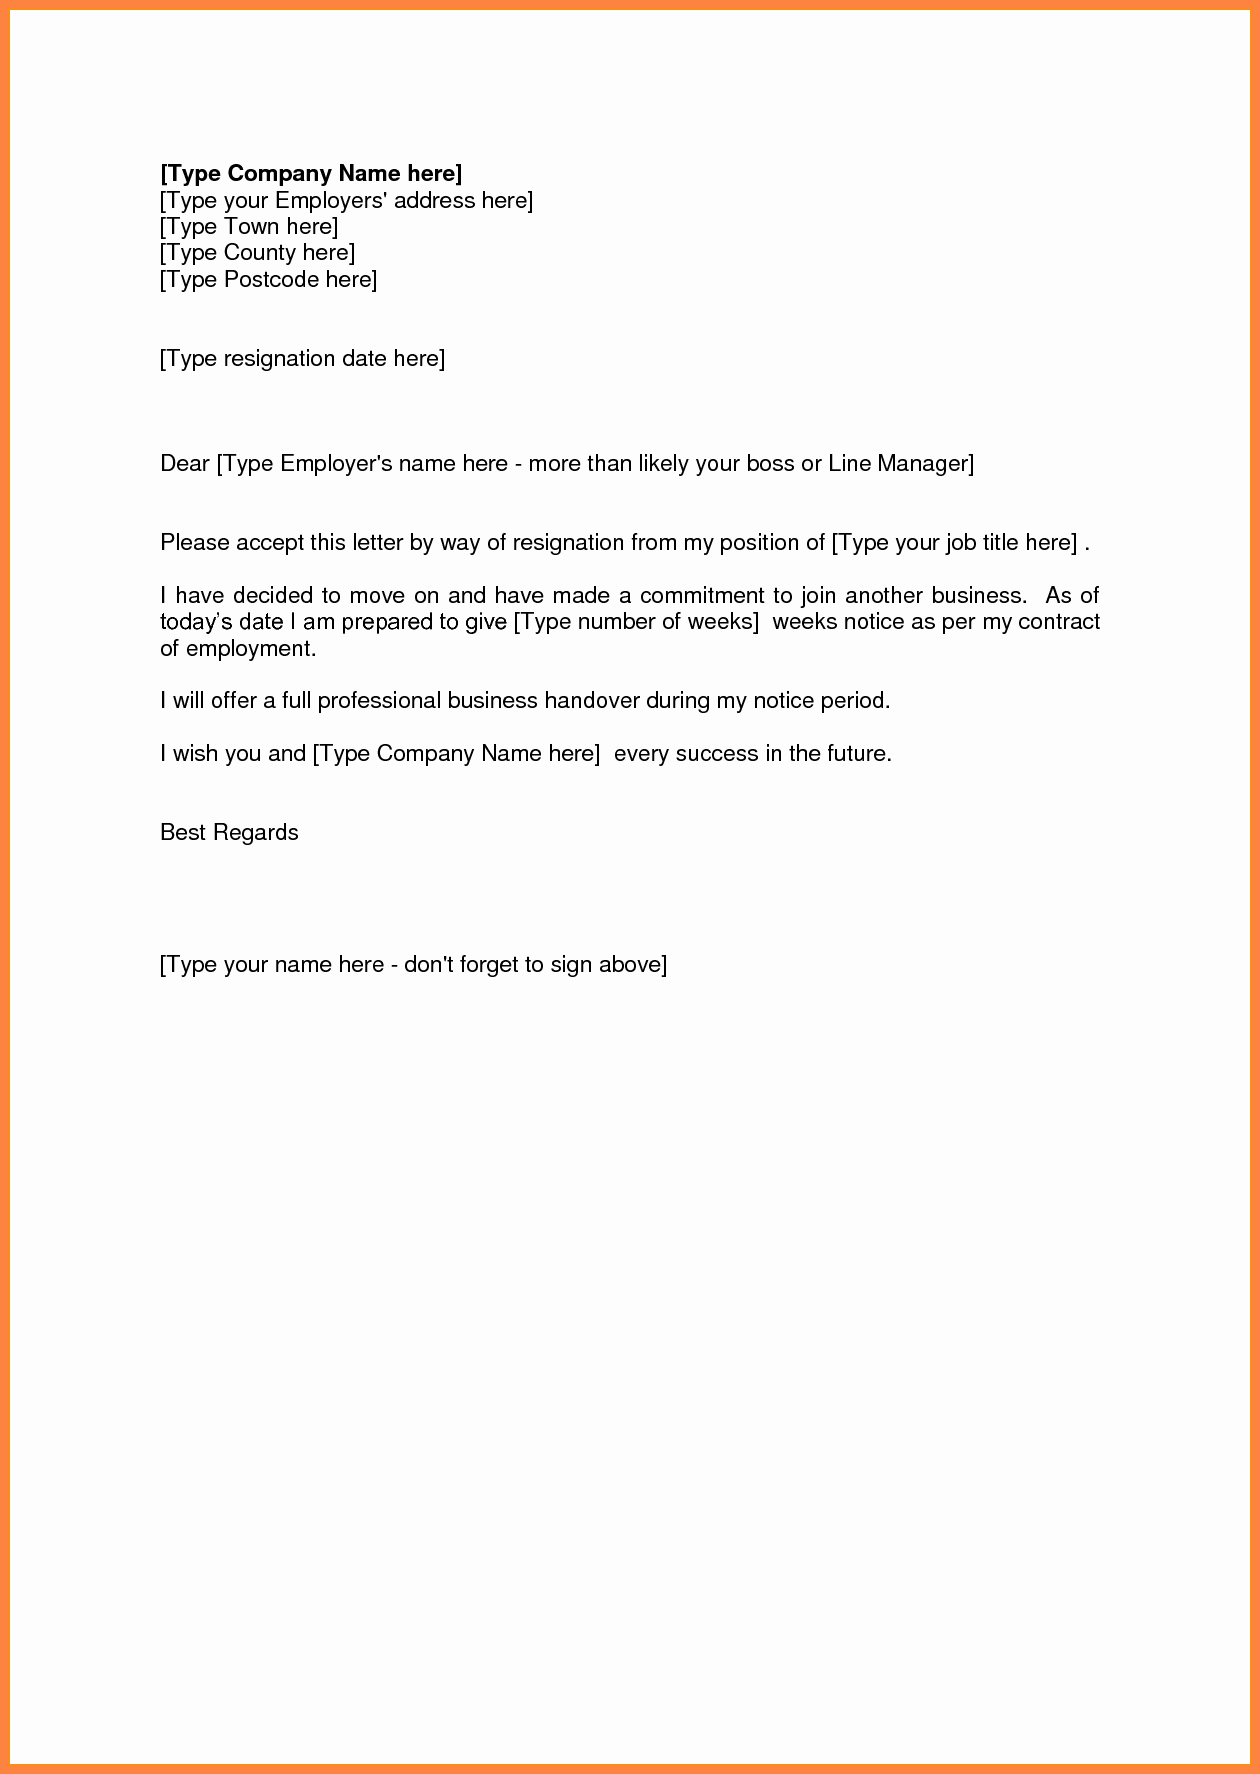 Resignation Letter Two Weeks Notice Elegant 4 Sample Resignation Letter 2 Weeks Notice Pdf